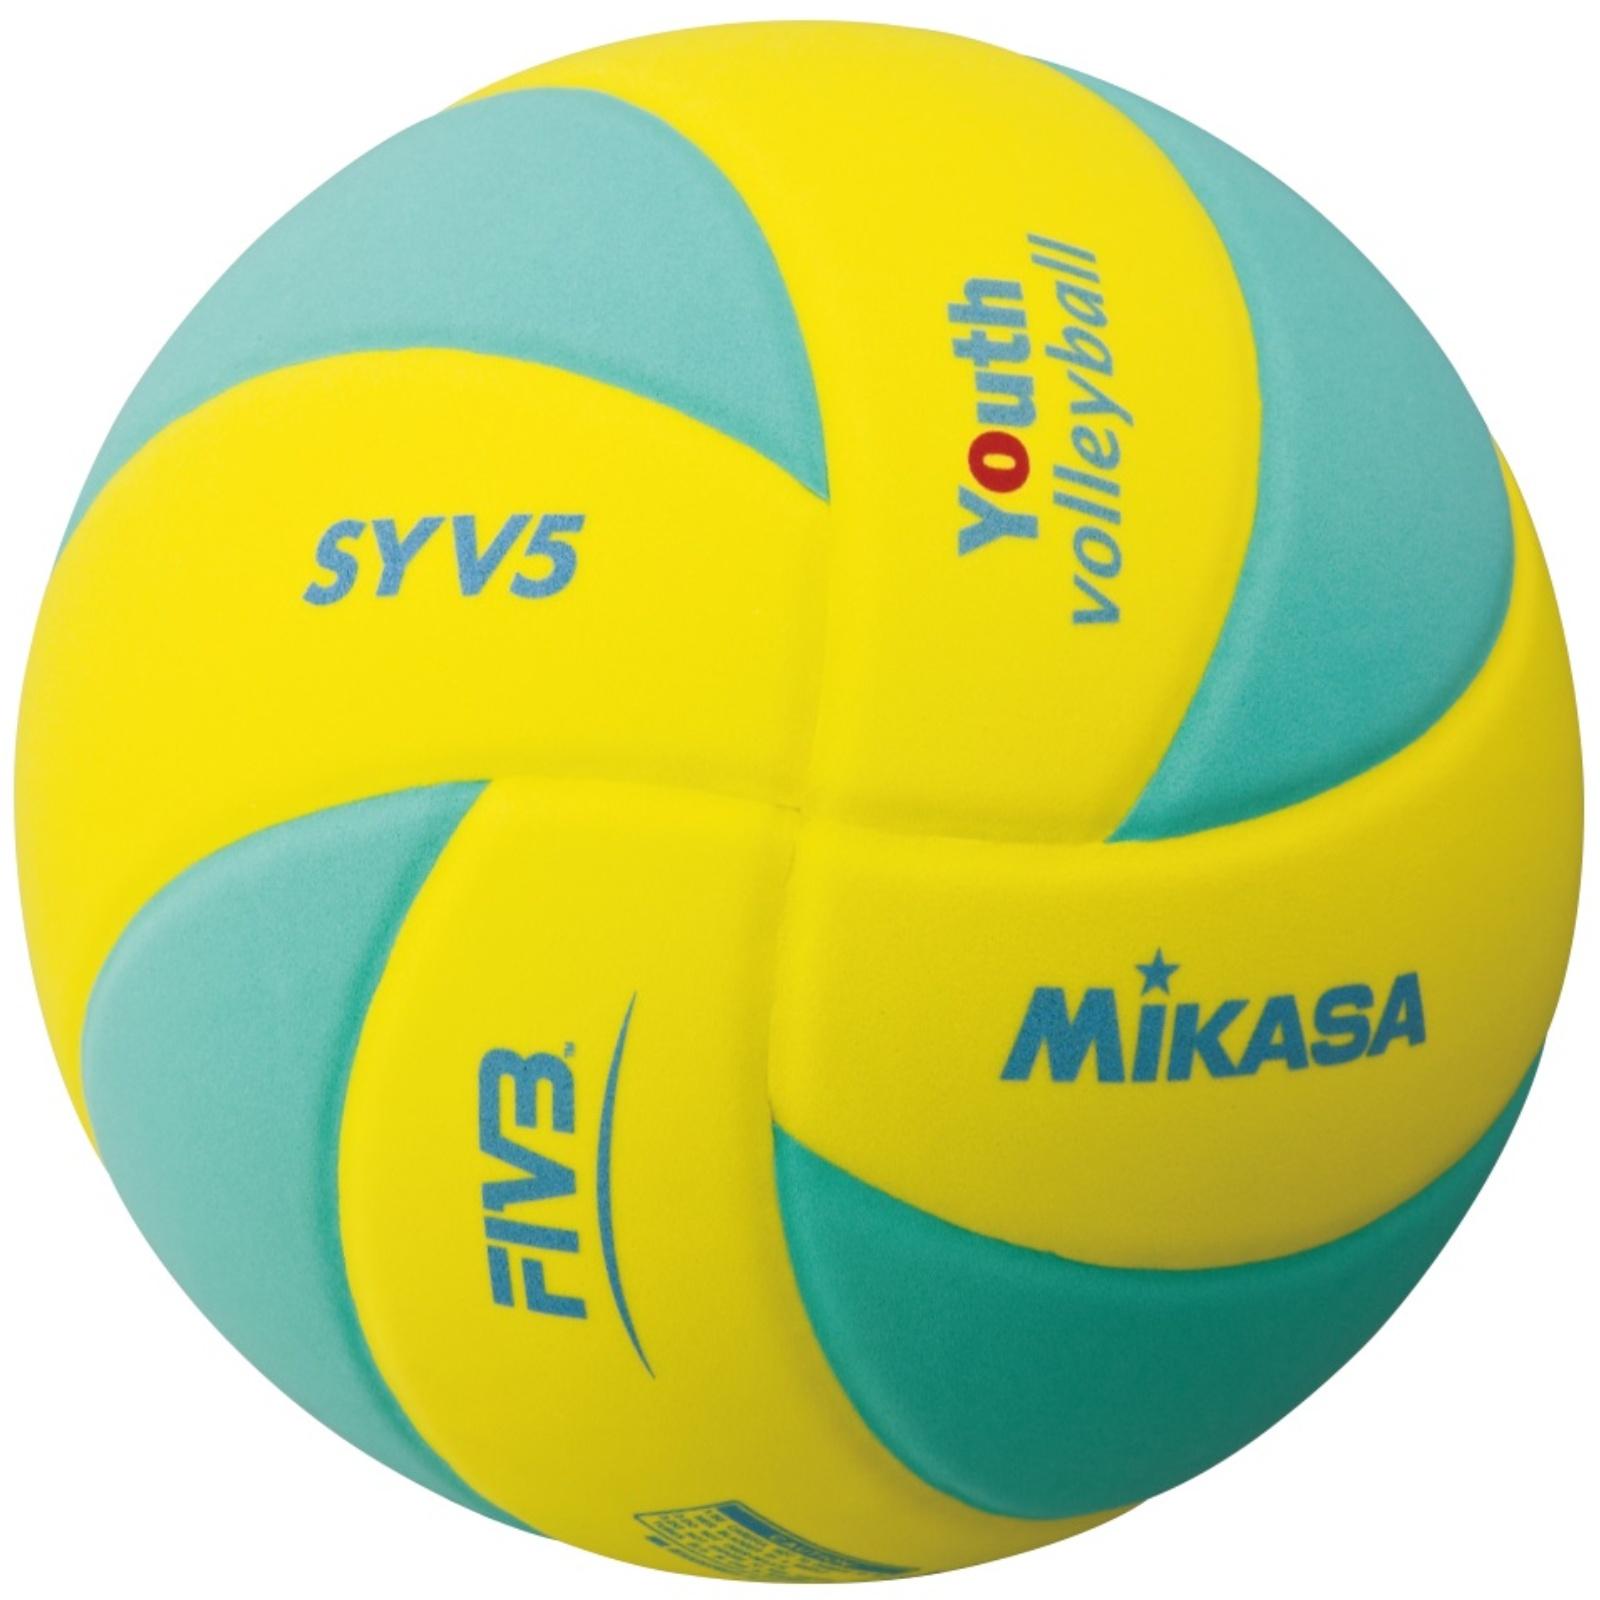 Volejbalový míč MIKASA Kids SYV5 zelený